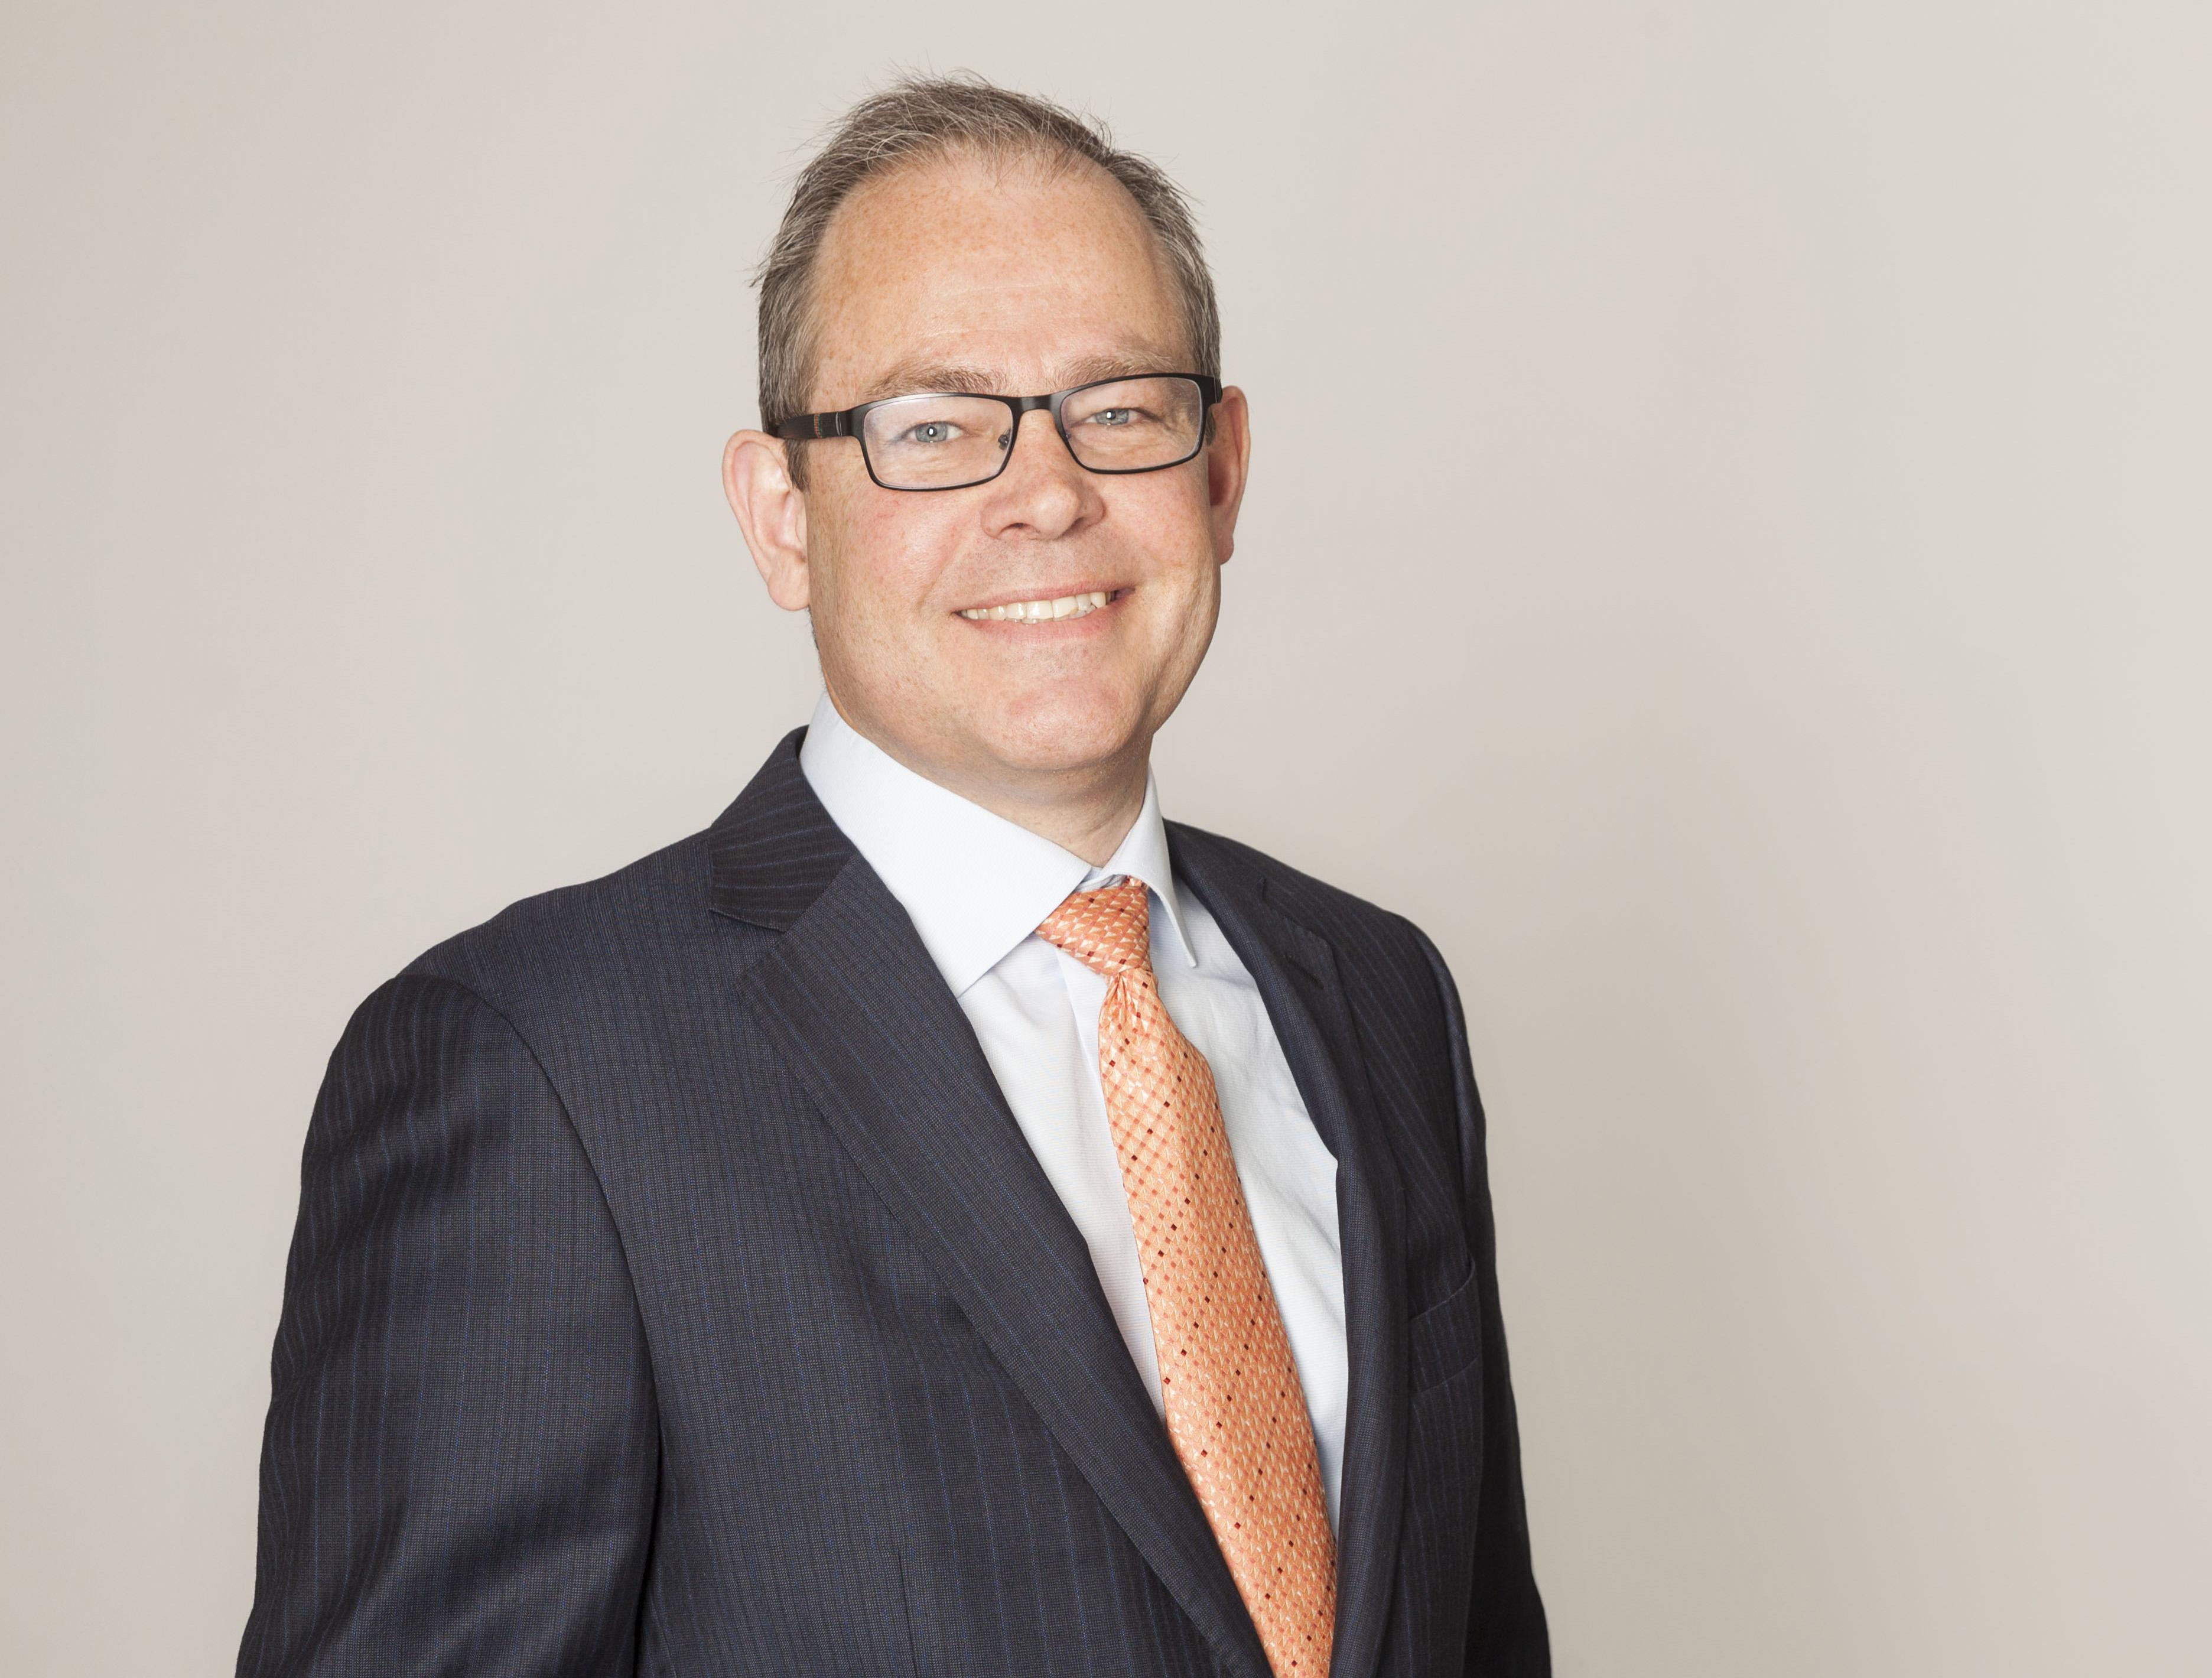 Erik R. Rijnbout